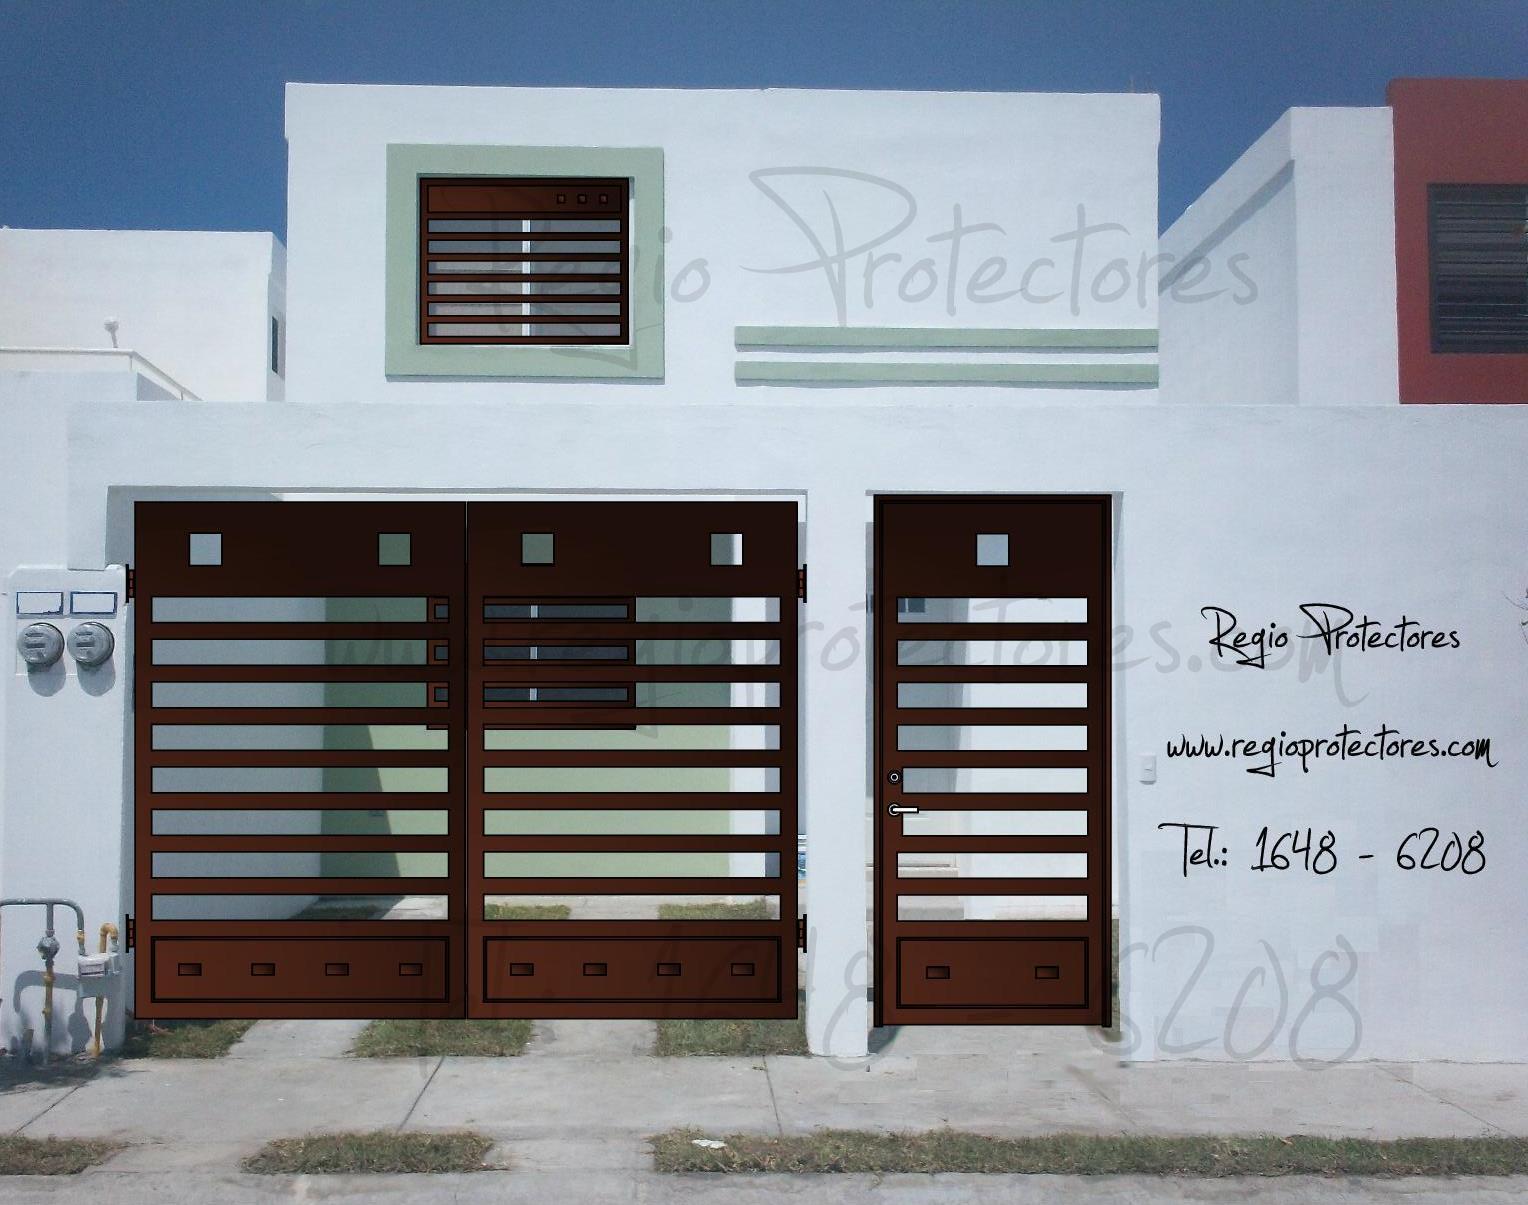 Top puerta portones protectores images for pinterest tattoos - Puertas de dos hojas ...